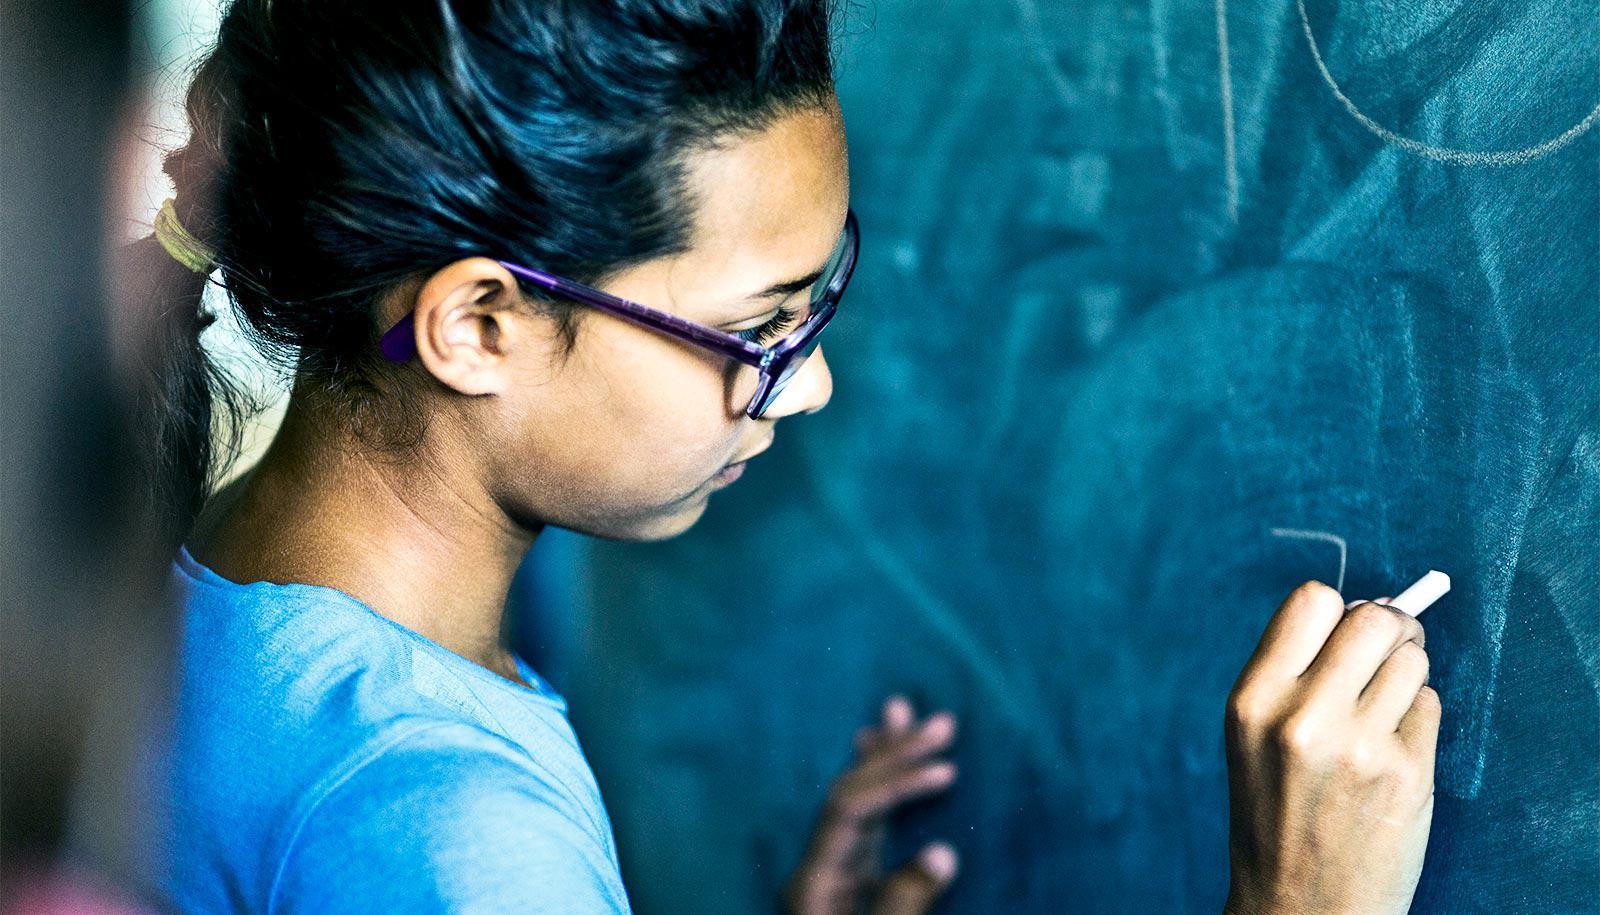 young girl at blackboard